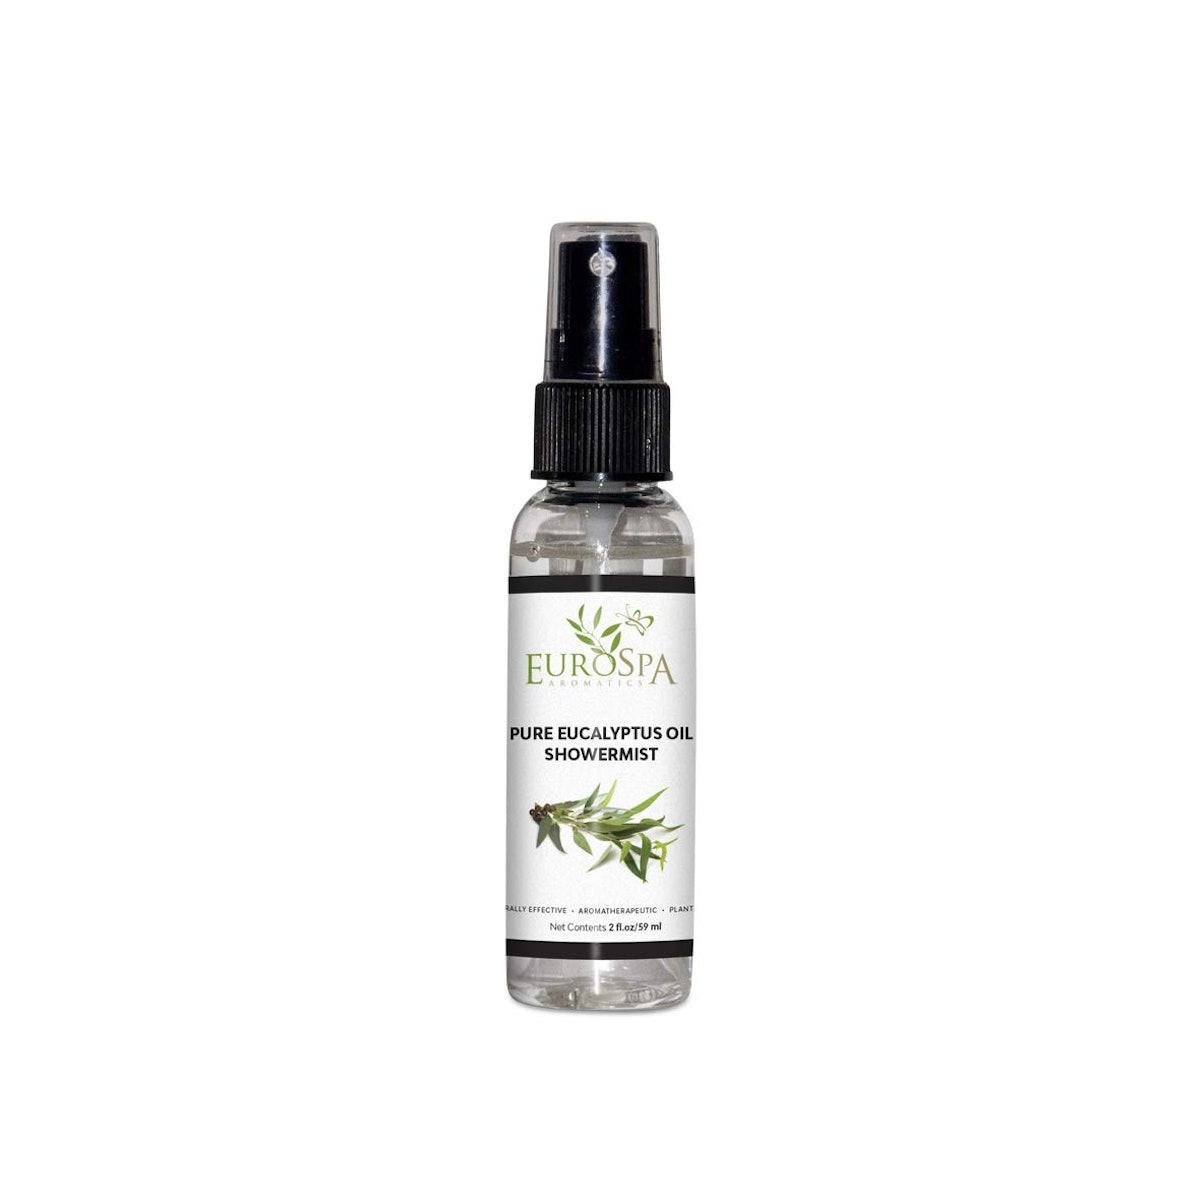 EuroSpa Aromatics Pure Eucalyptus Oil Shower Mist